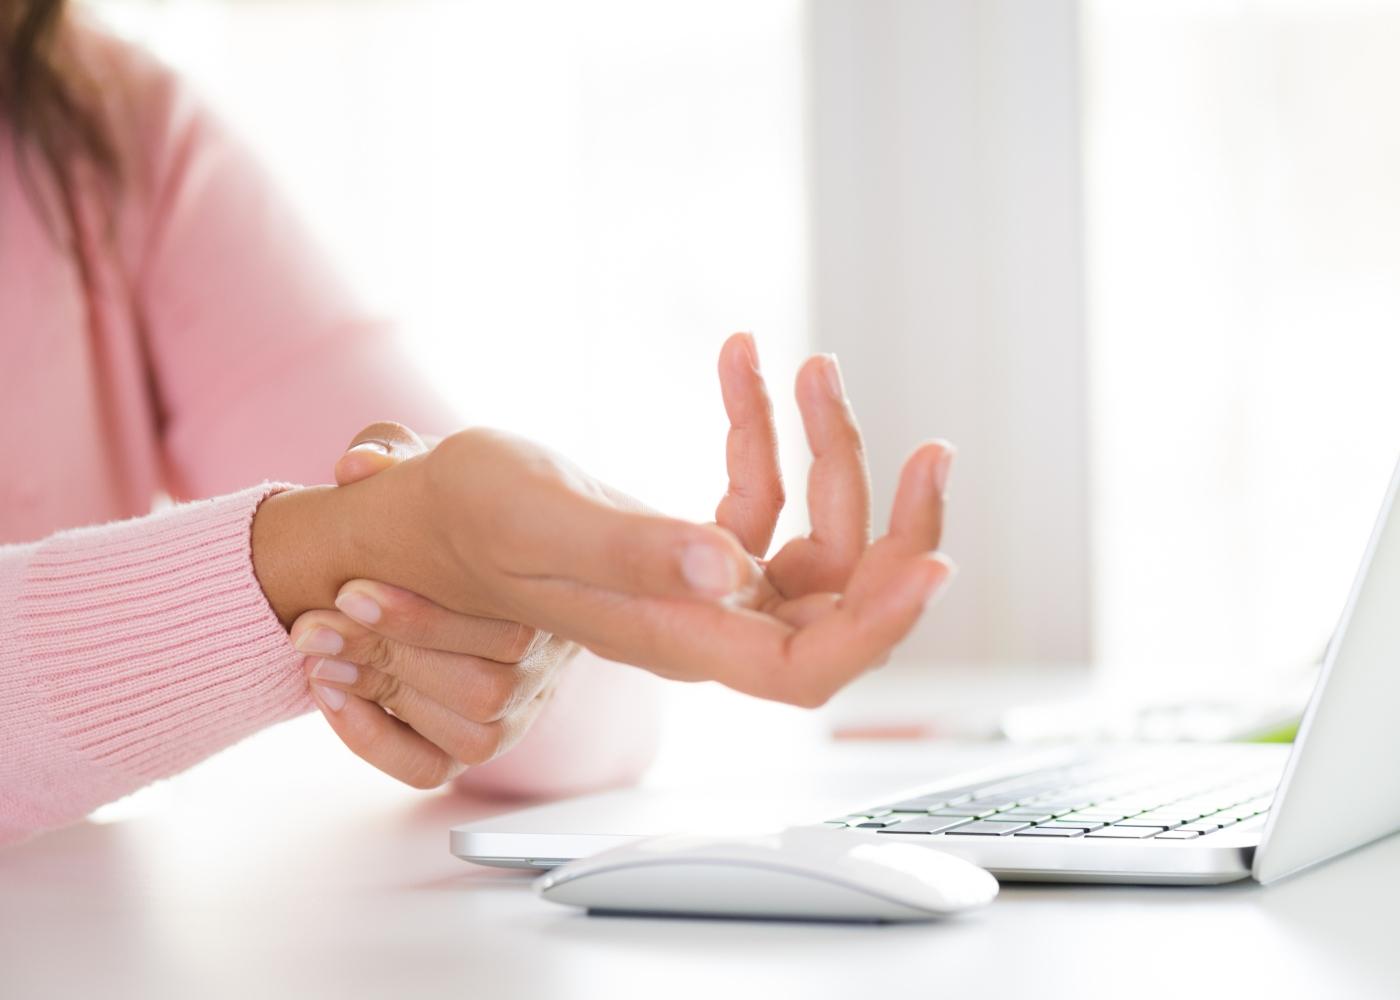 pessoa ao computador a queixar-se do pulso